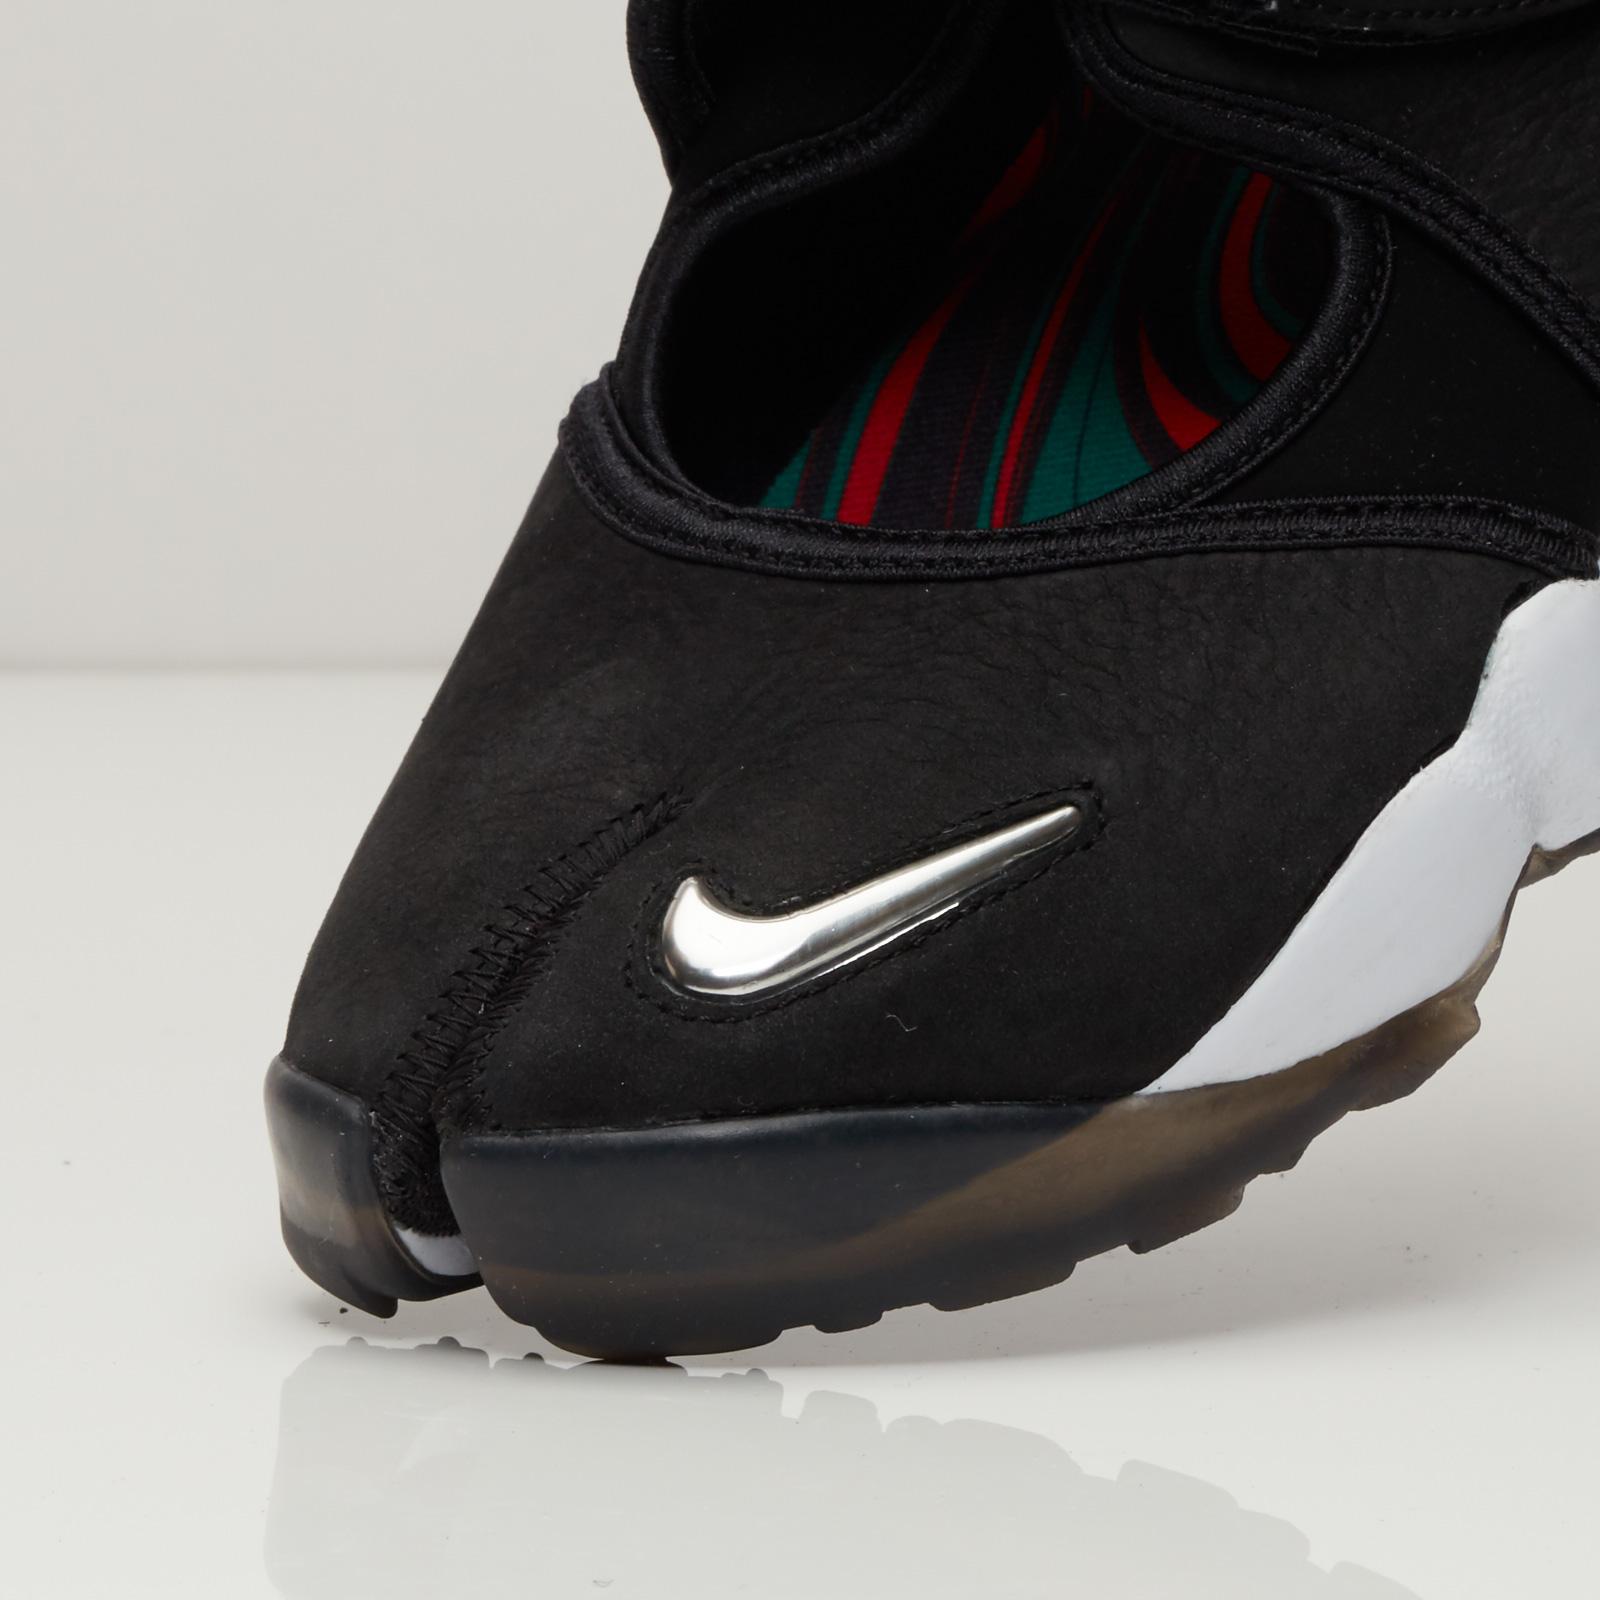 8e8afd207584 Nike Air Rift Anniversary QS - 861532-001 - Sneakersnstuff ...